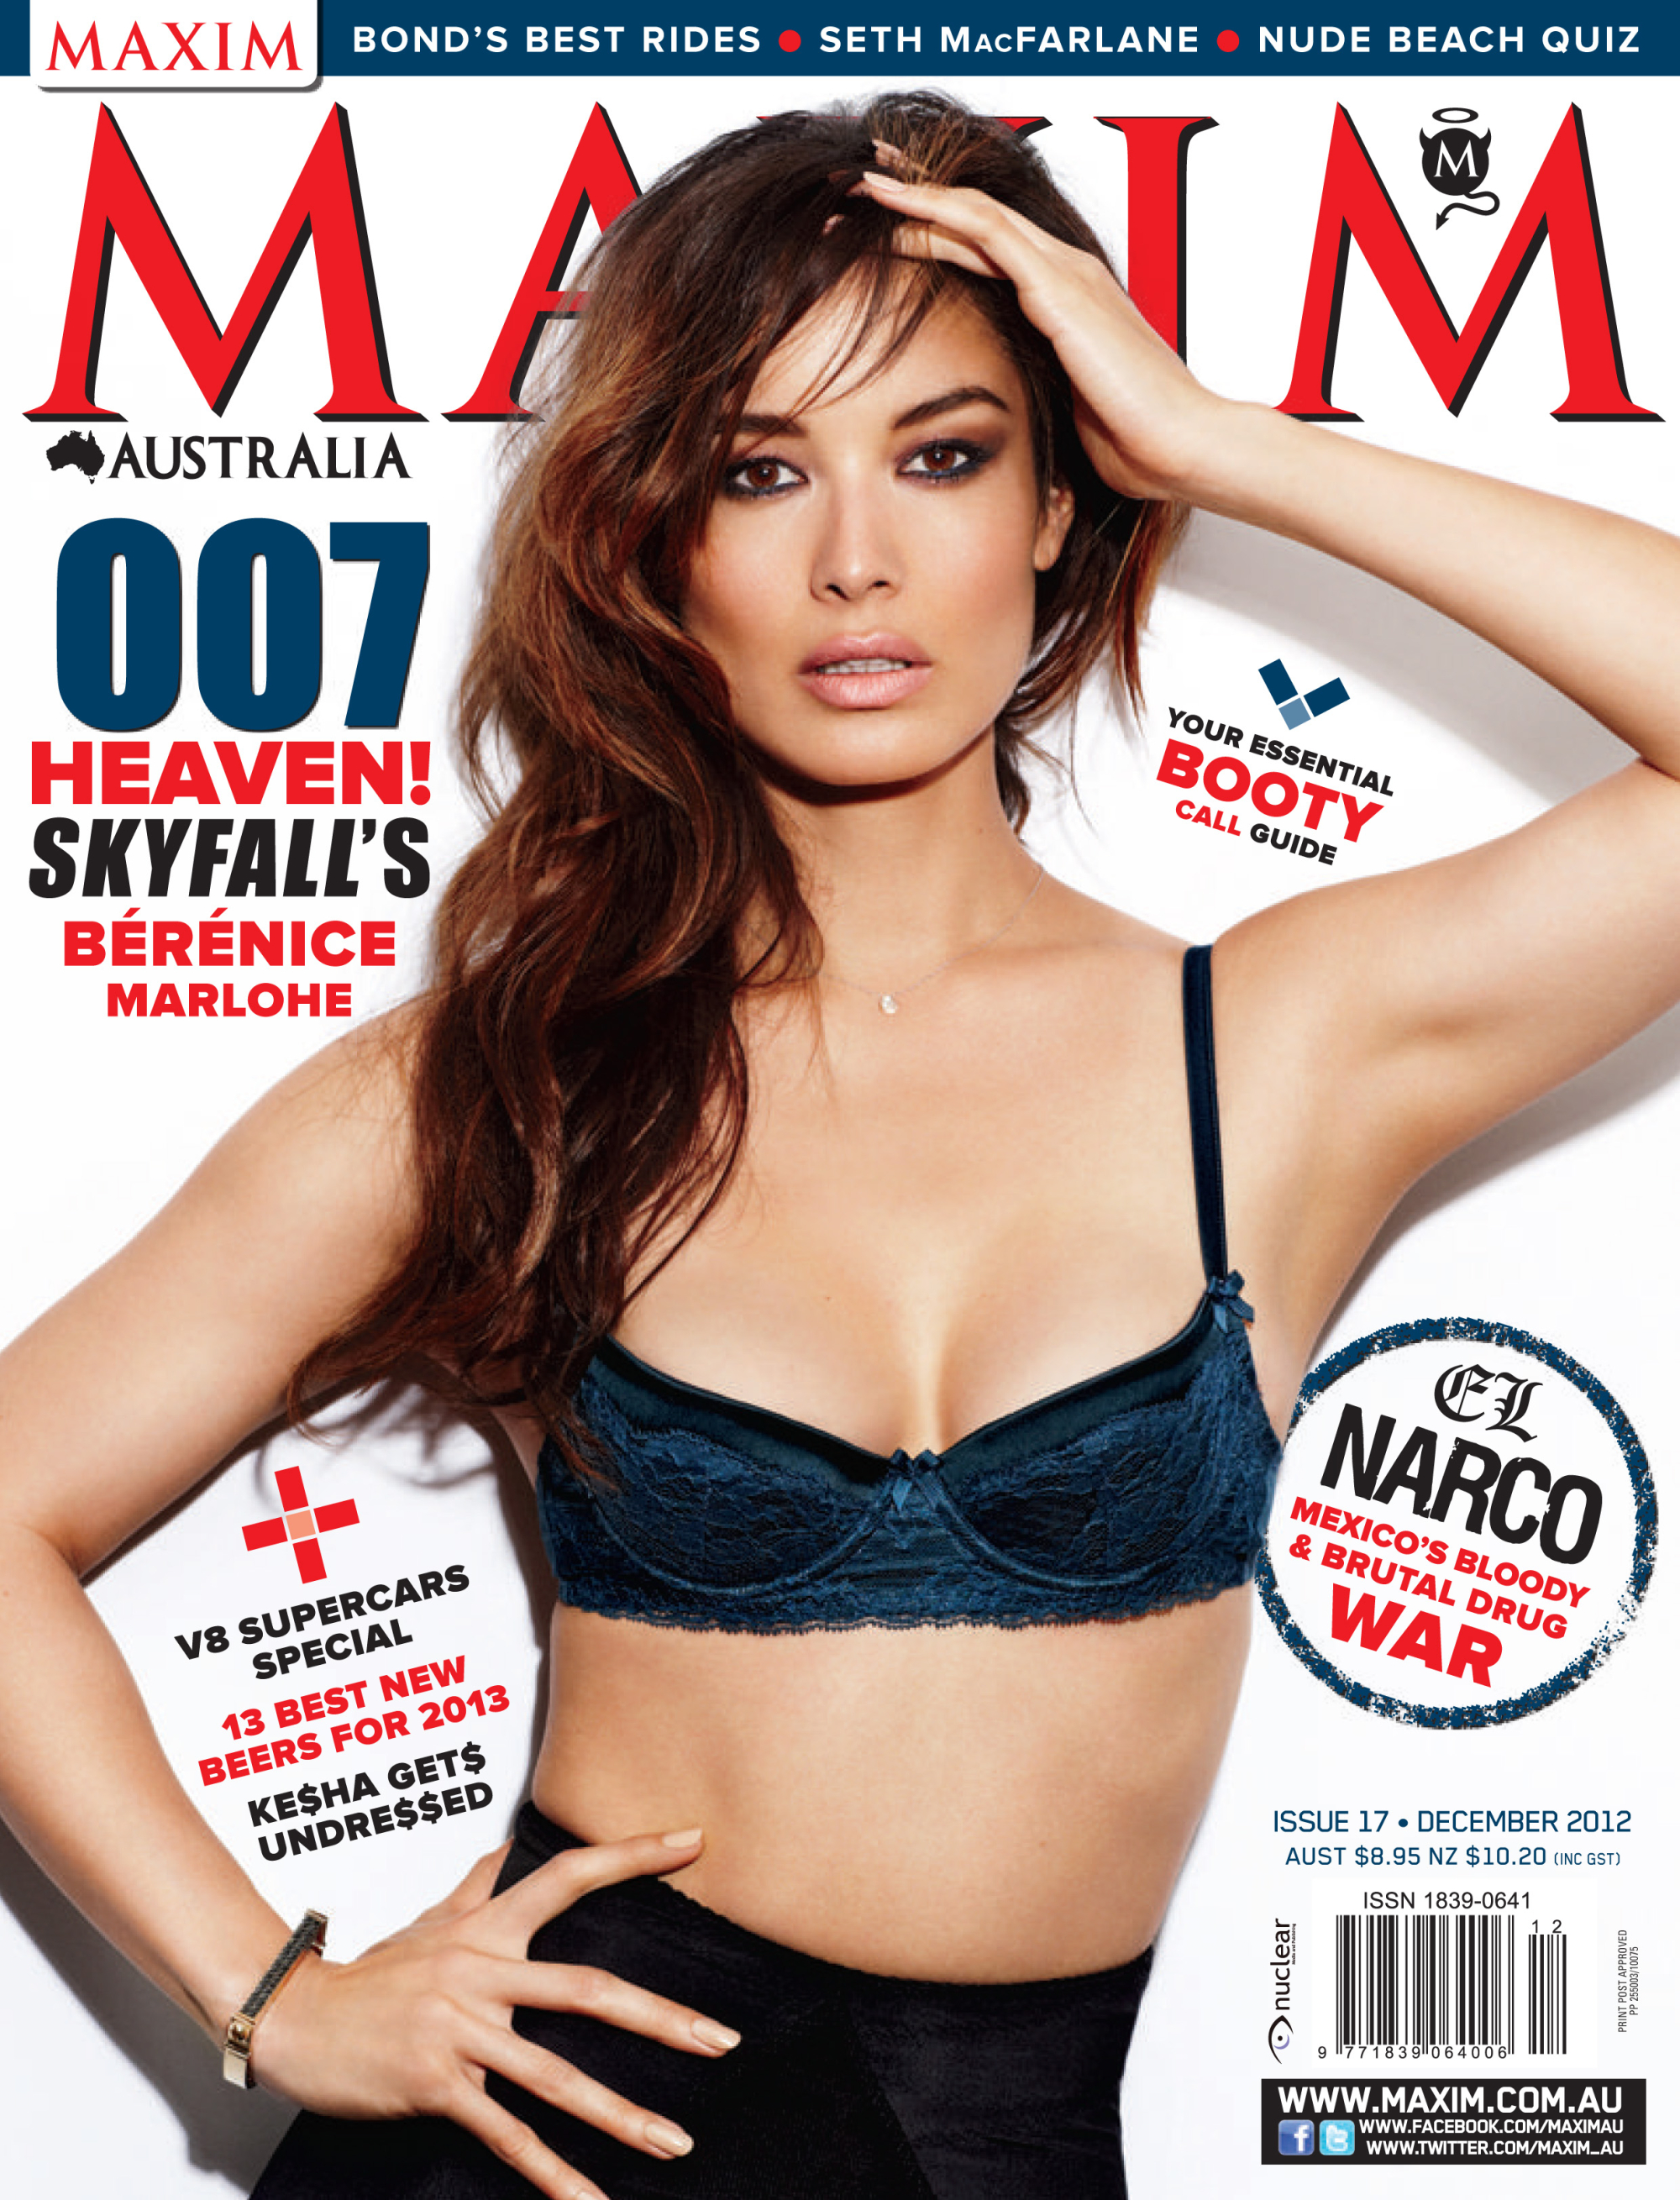 Зарубежные журналы. Maxim - самый читаемый мужской журнал. В круге